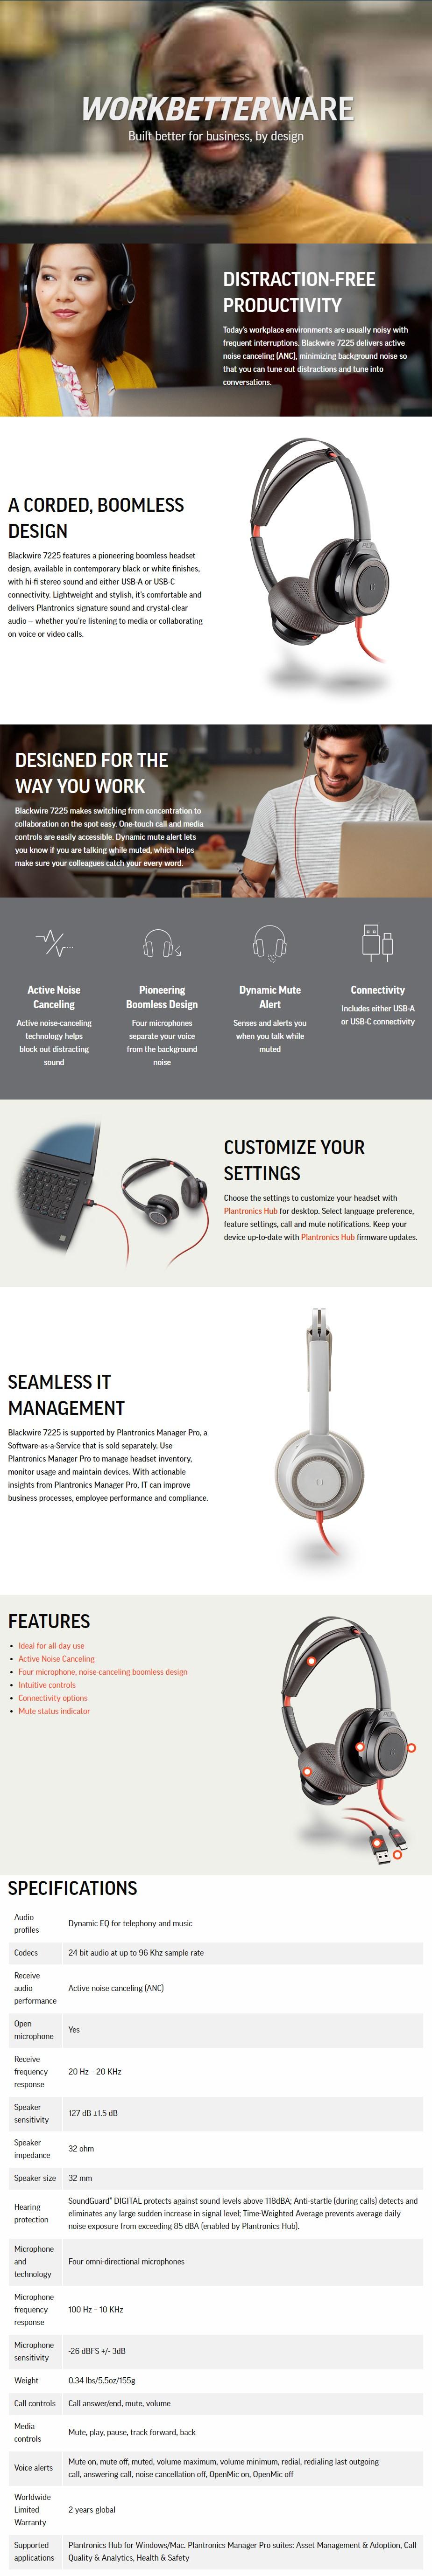 plantronics-blackwire-noise-cancelling-usb-stereo-headset-black-ac31004-1-.jpg